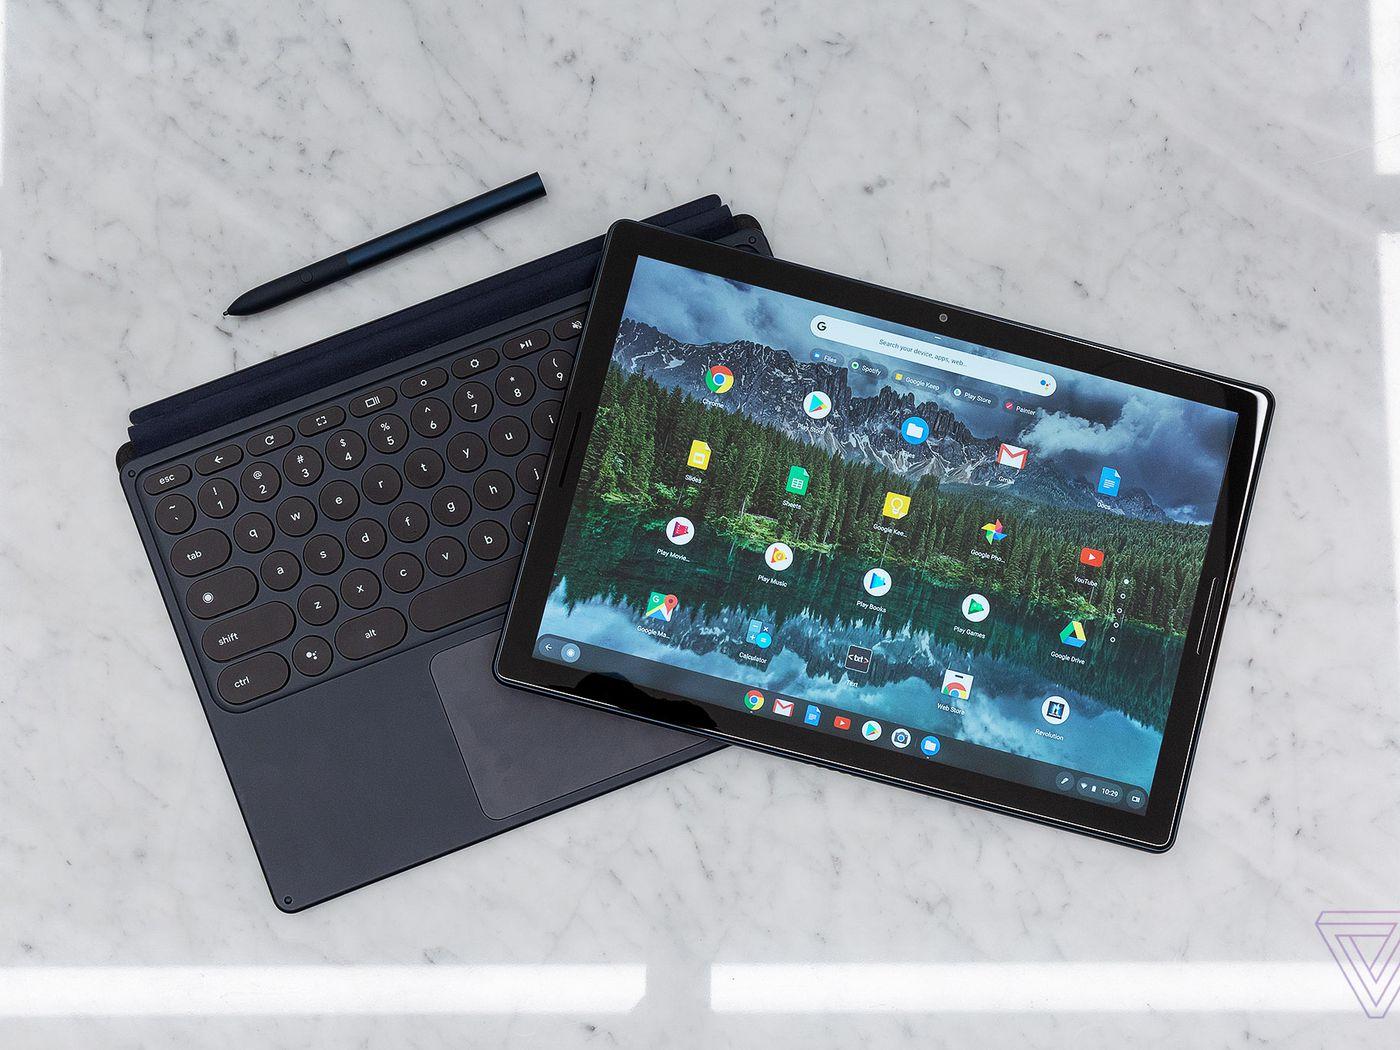 Sensational The Pixel Slate First Look At Googles New Tablet The Verge Beutiful Home Inspiration Semekurdistantinfo